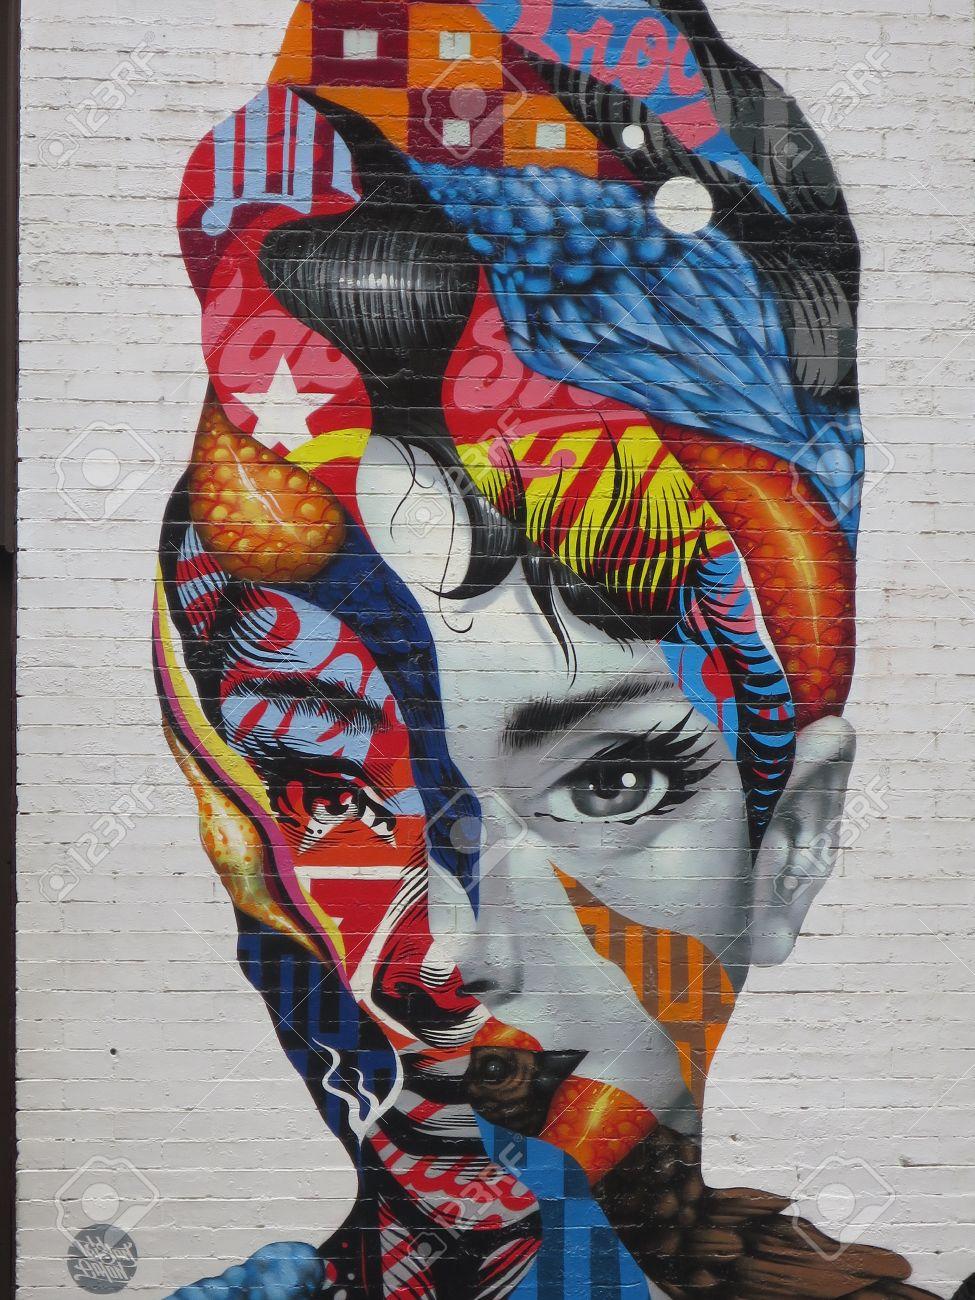 Graffiti wall usa - Knstlerisches Graffiti On A Wall In Little Italy New York City Usa Stock Photo